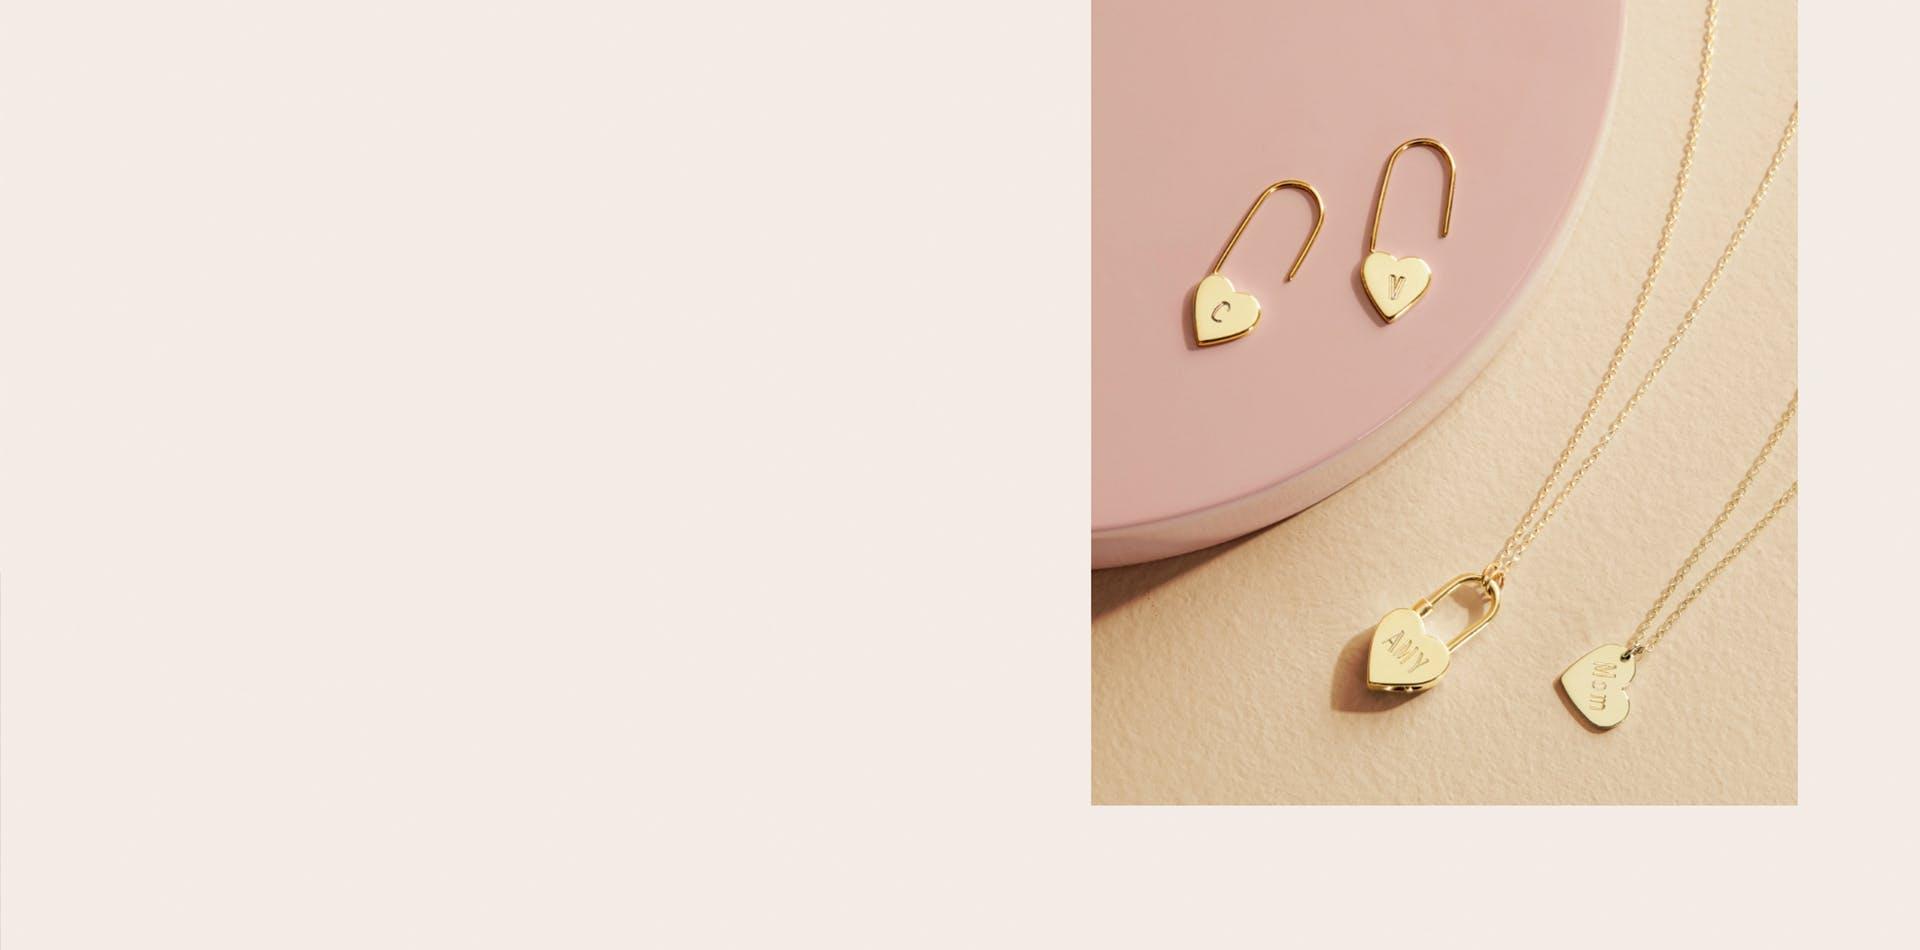 Shinola Women's Jewlery: Heart necklace and charm